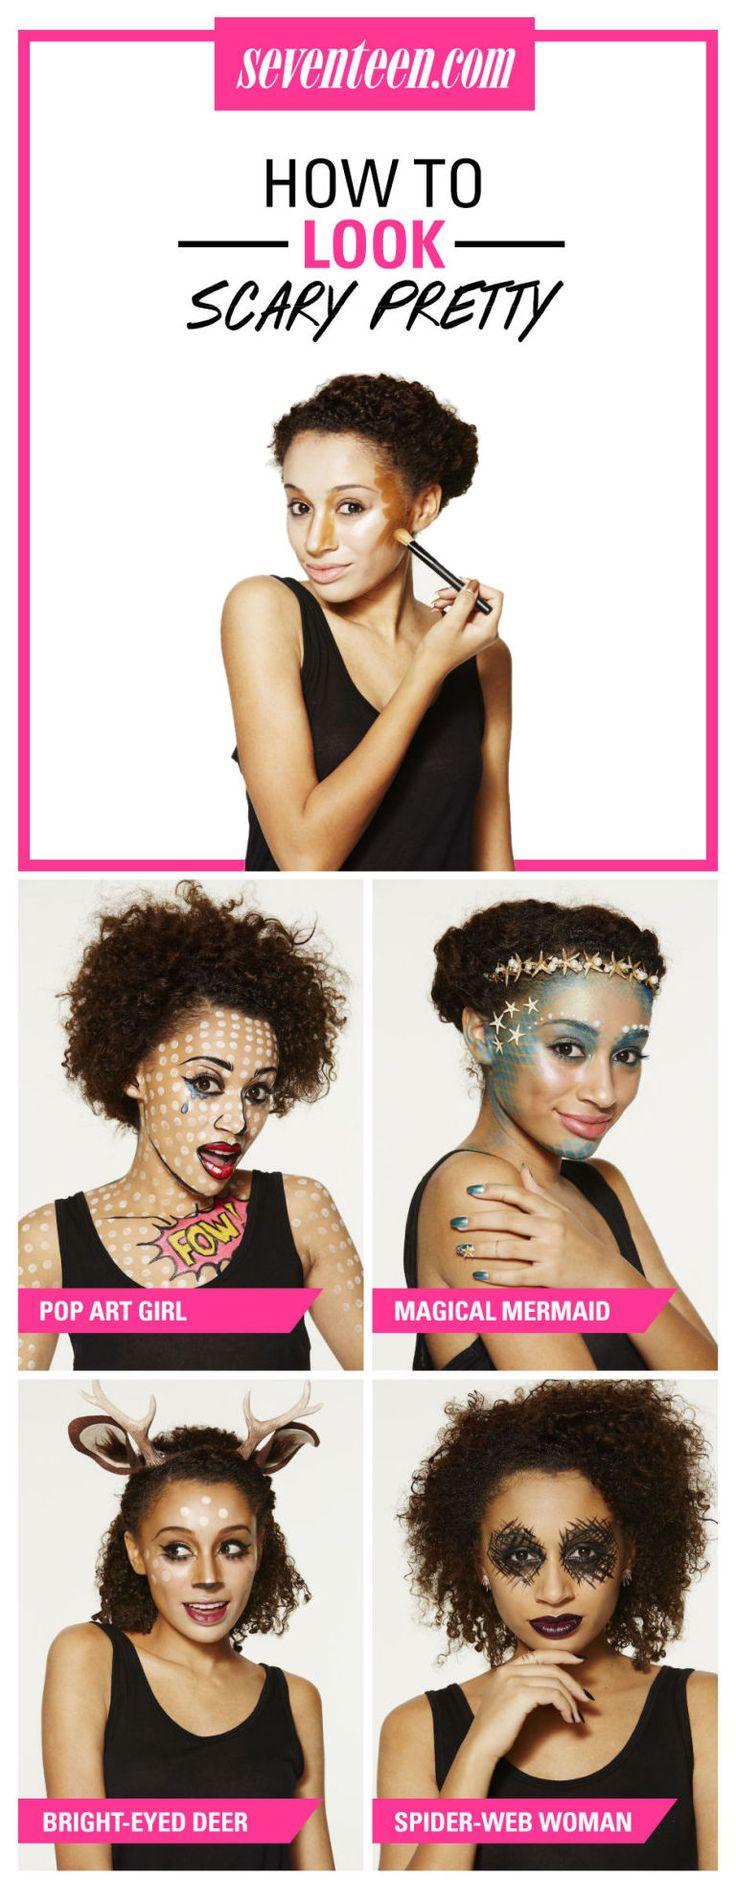 4 Scary Pretty Halloween Makeup Tutorials